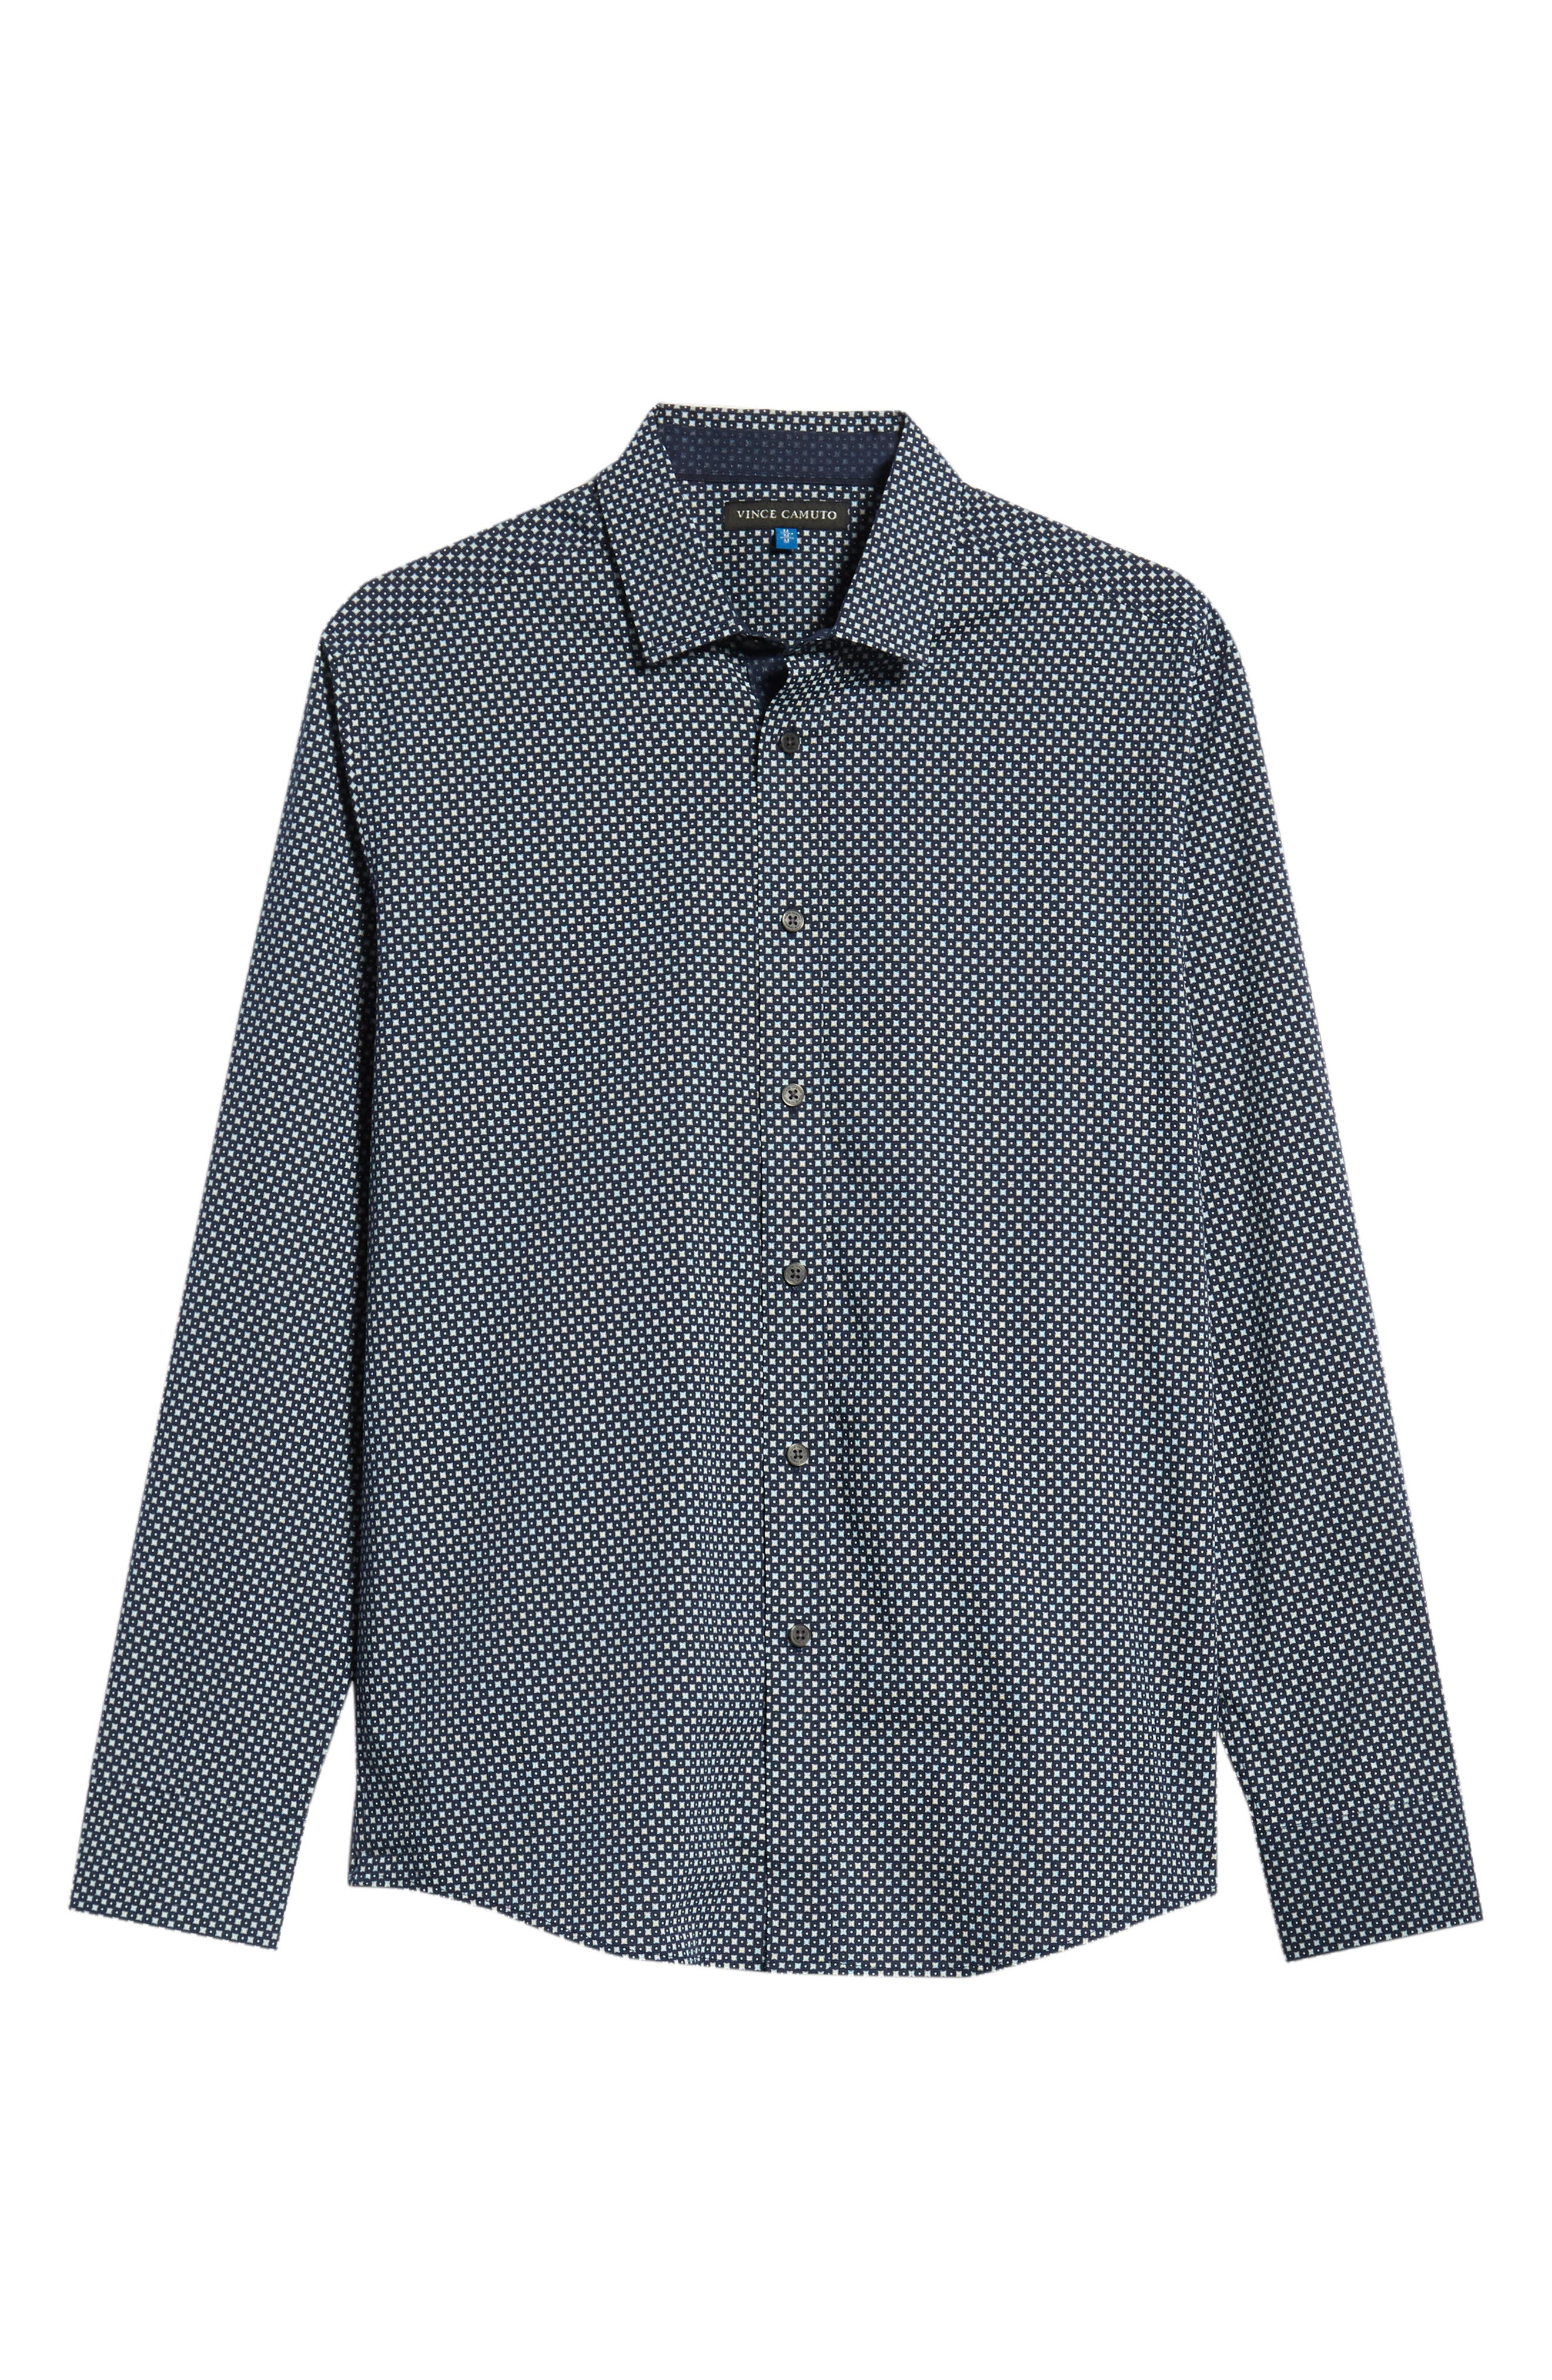 Regular Fit Geometric Dot Sport Shirt,                             Alternate thumbnail 5, color,                             NAVY/ WHITE POPLIN PRINT